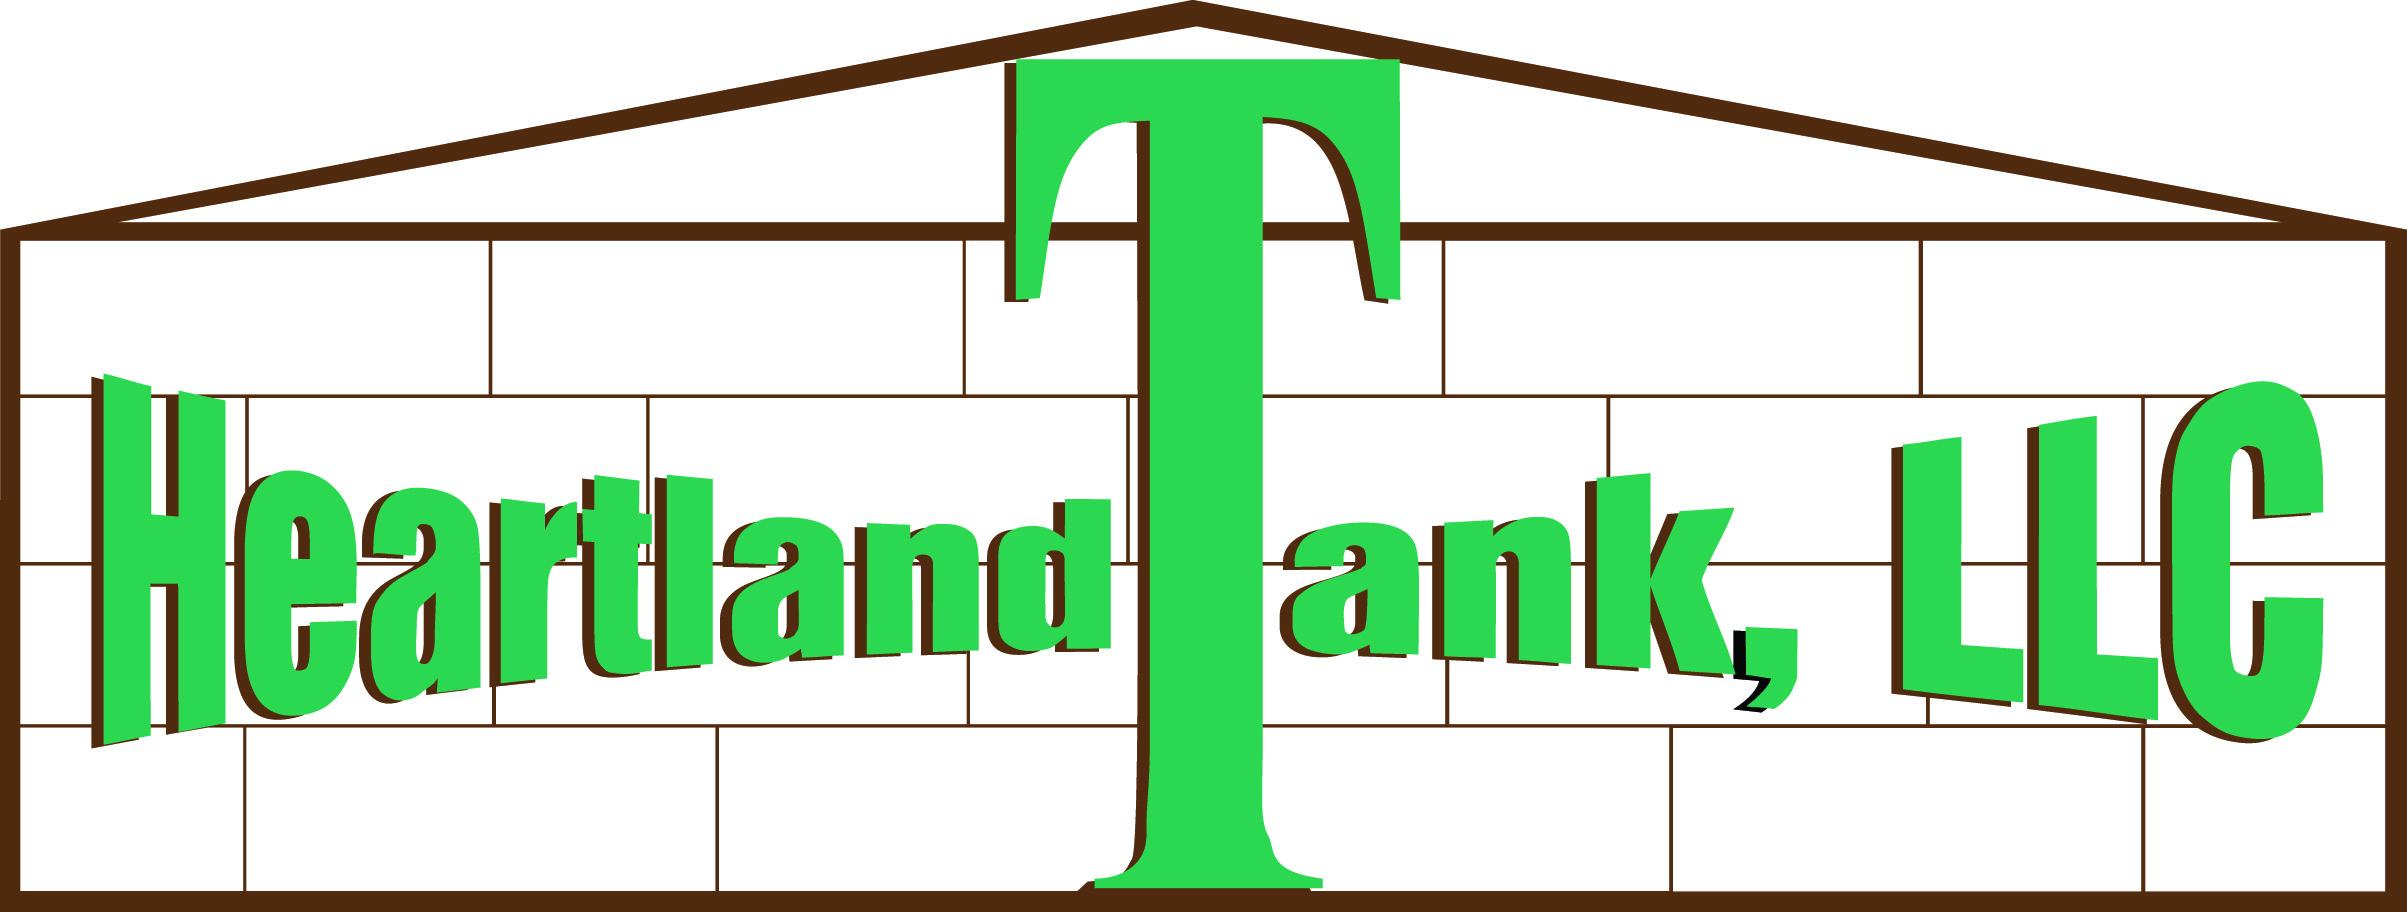 Heartland Tank LLC